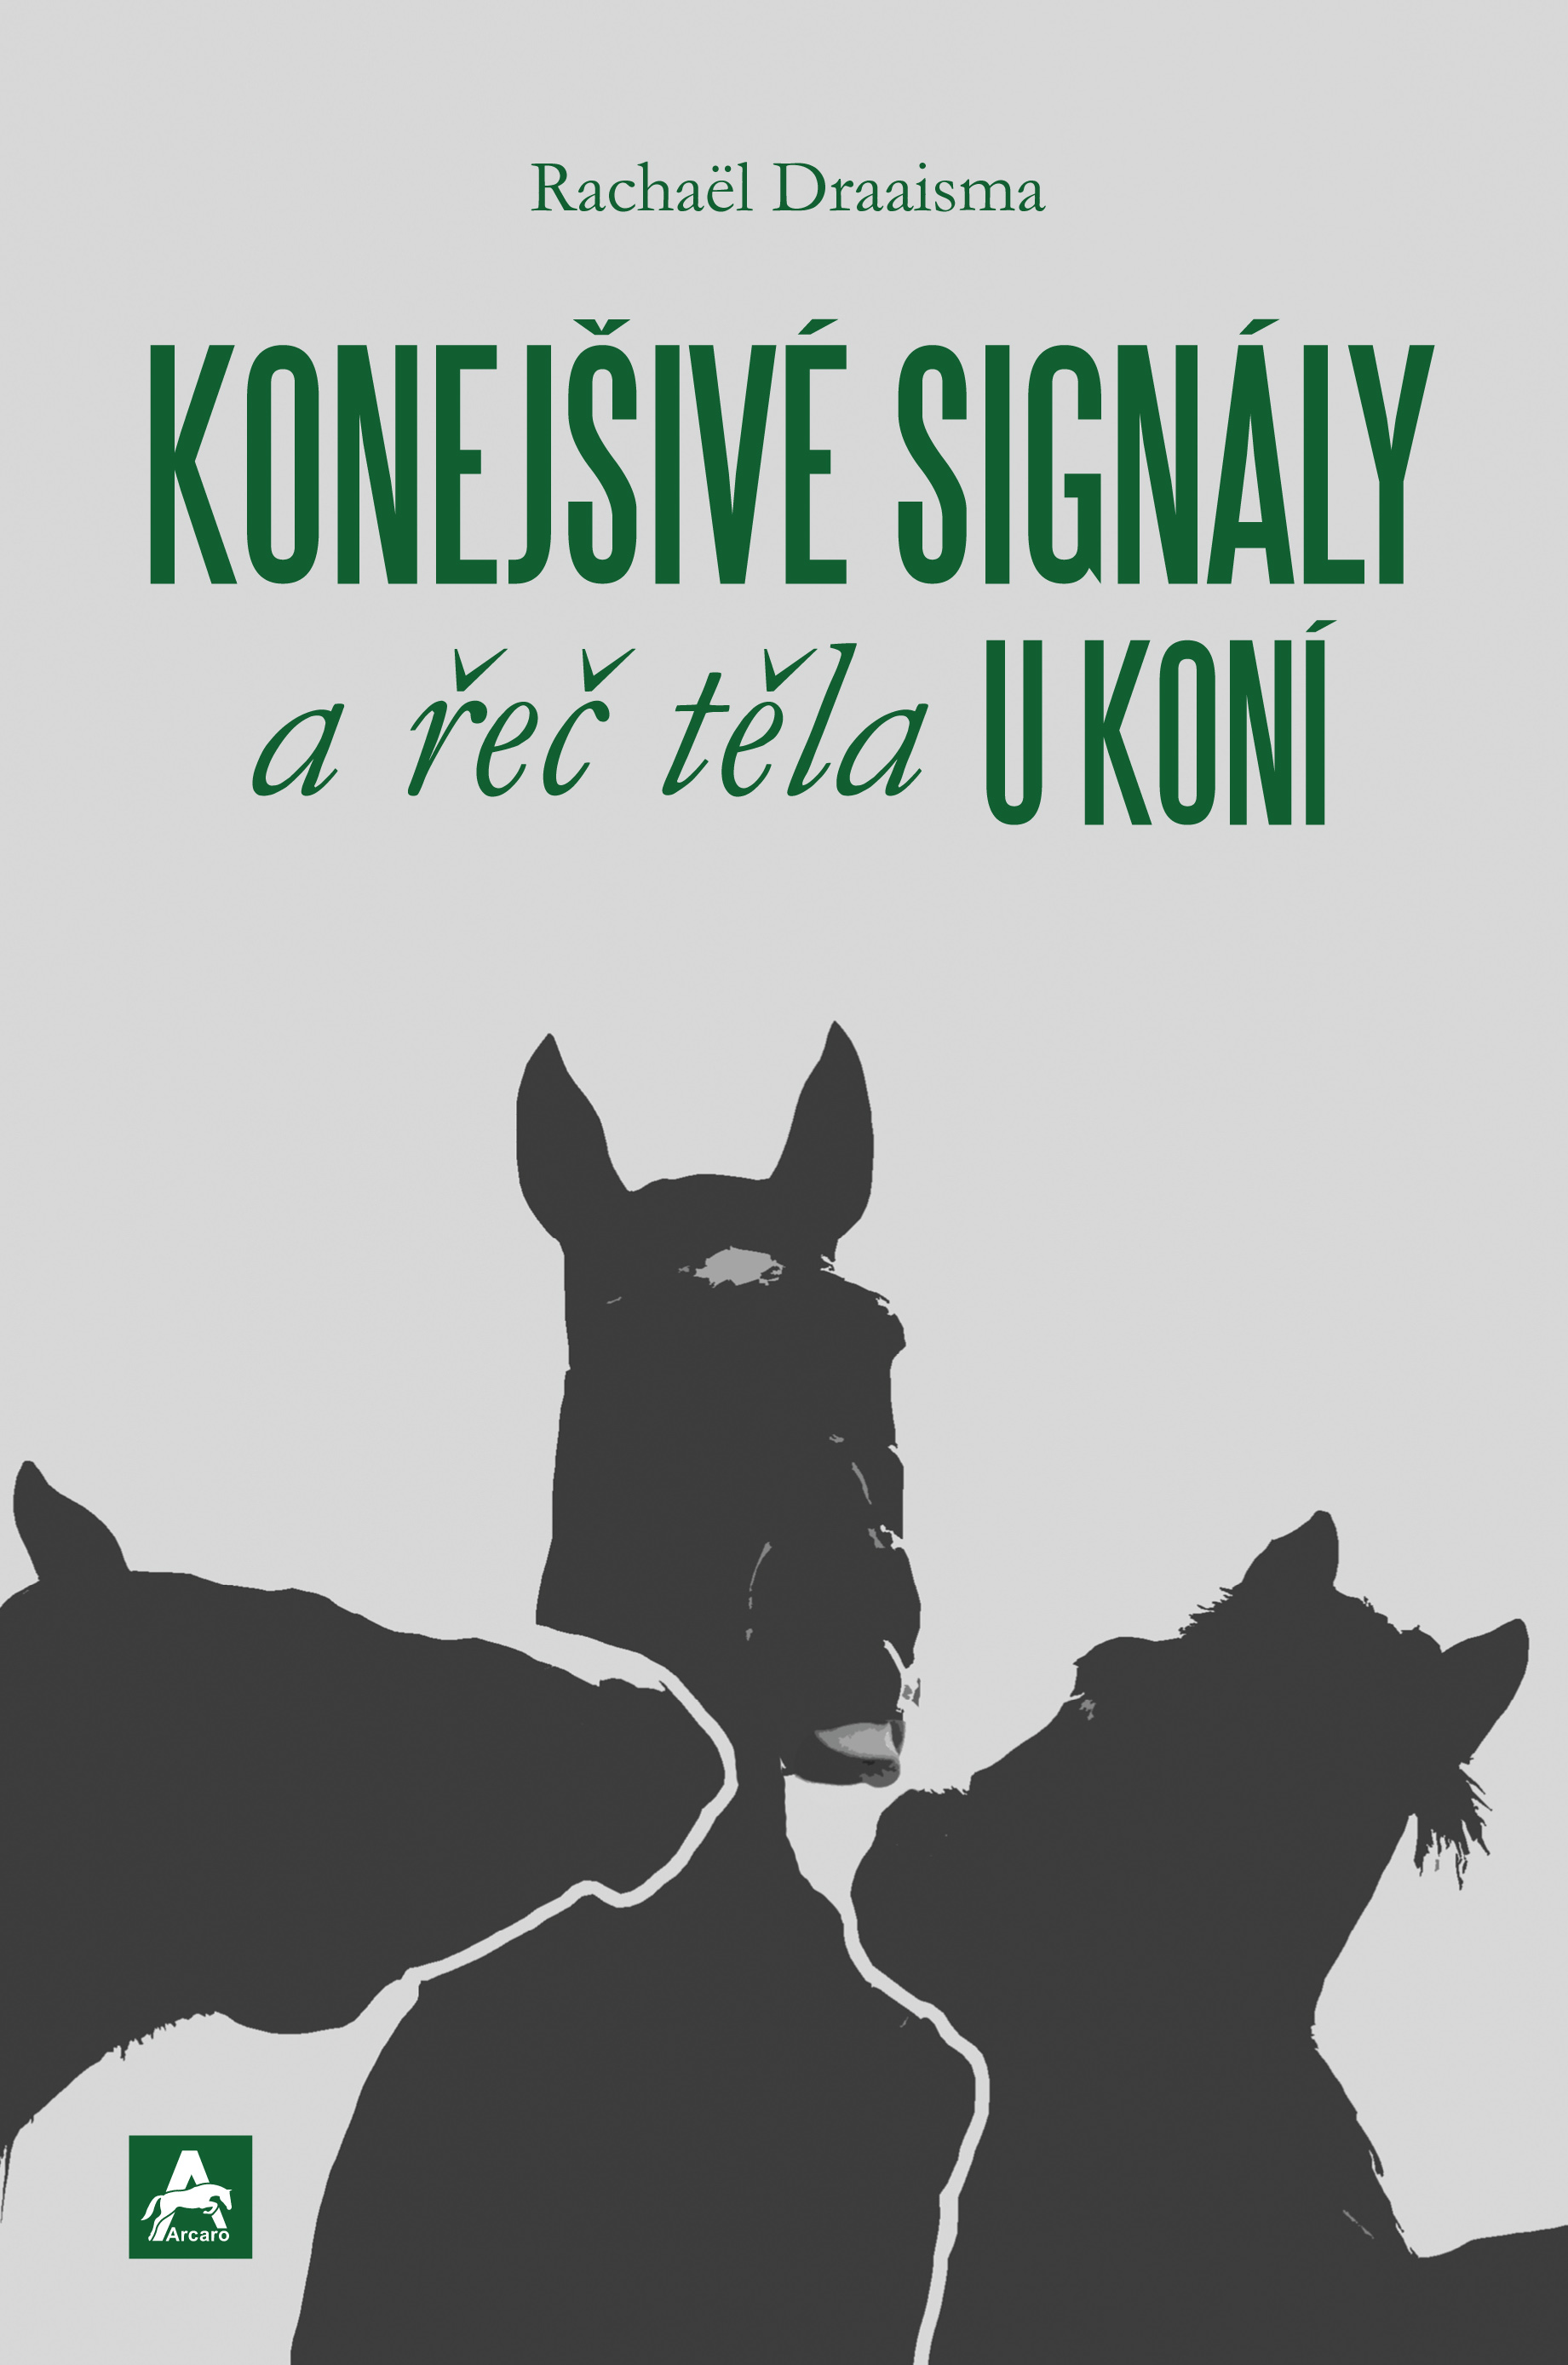 Konejsive_signaly_obalka_predni_final